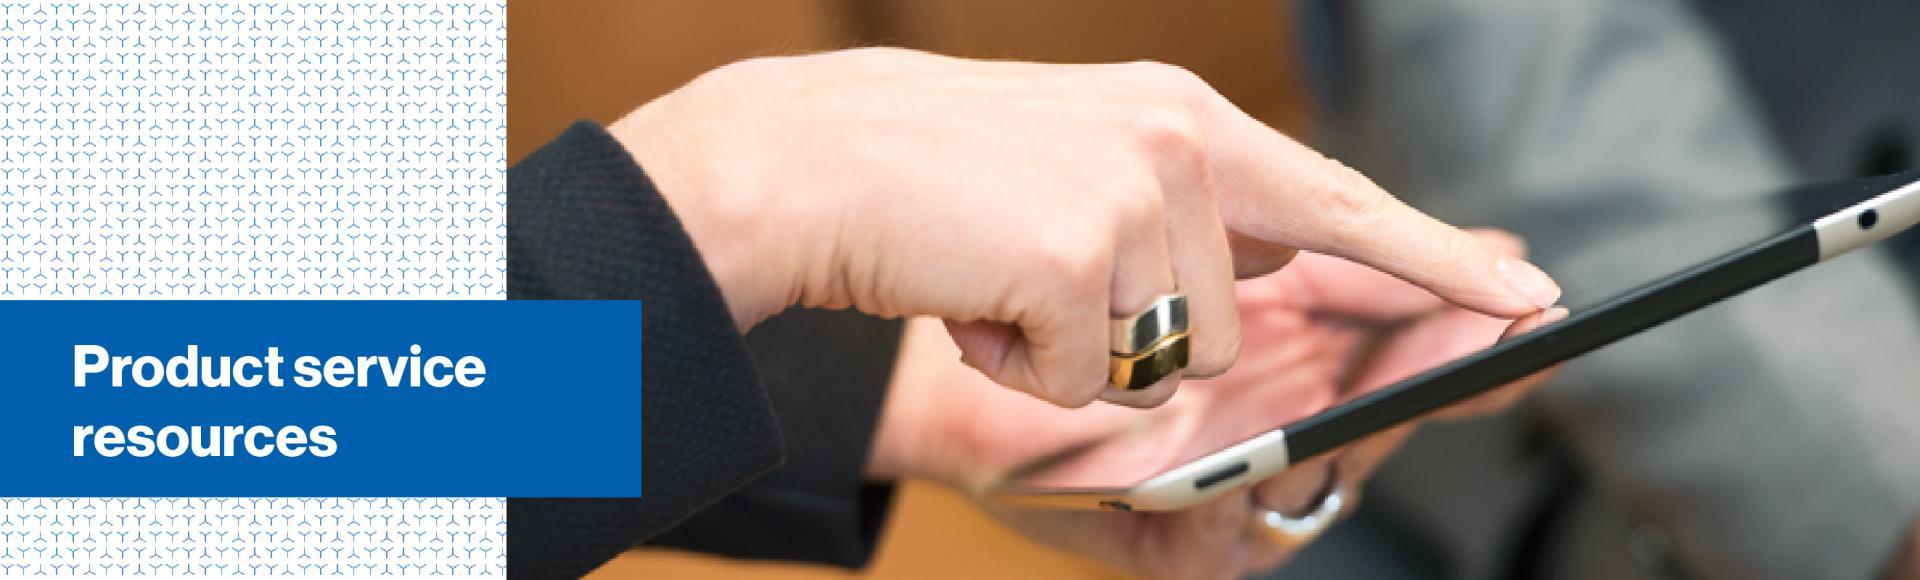 Image of womens hand touching an iPad screen